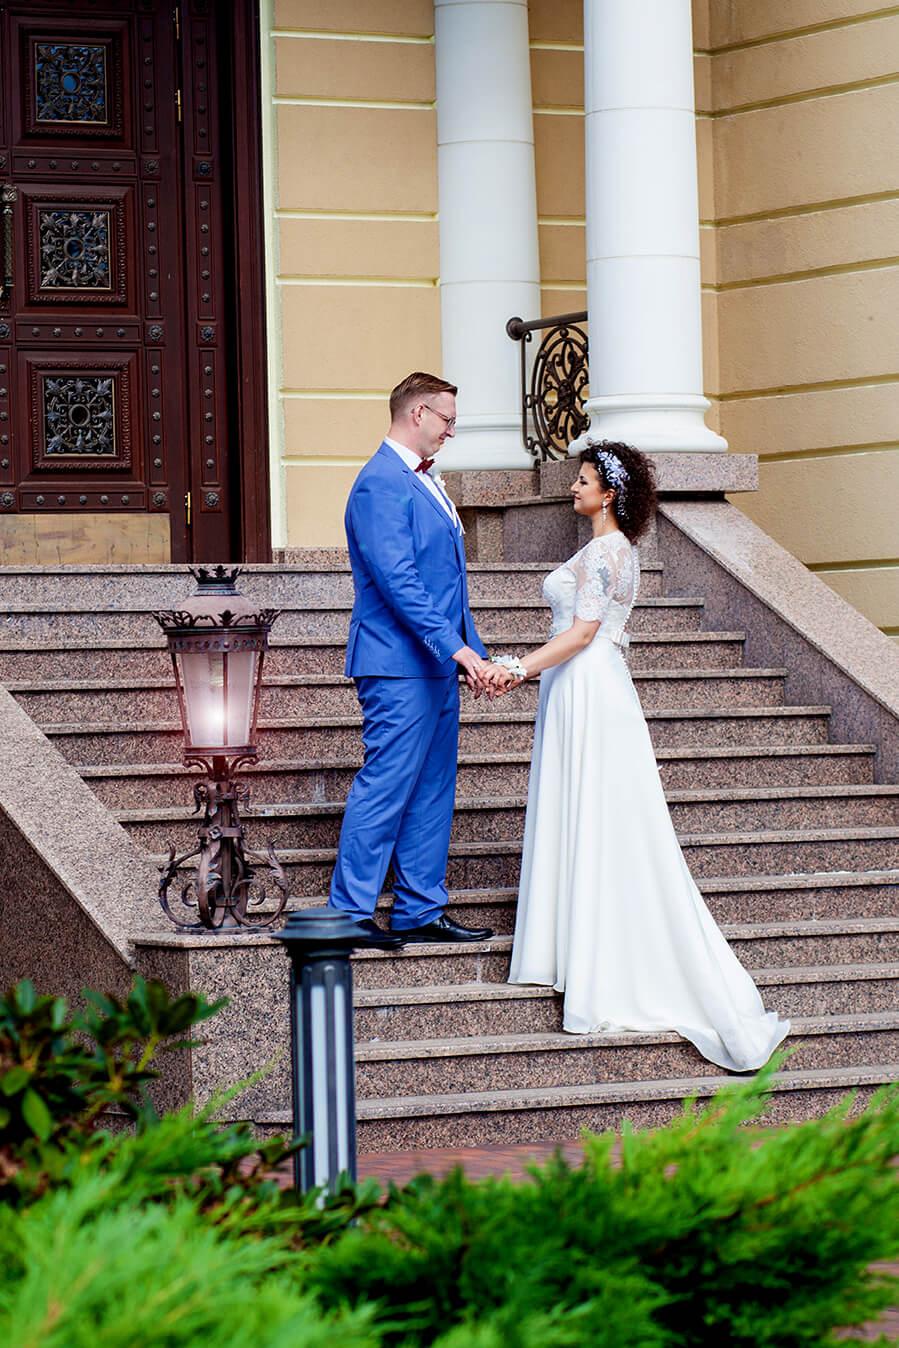 3-svadebnyj-fotograf-videooperator-svadebnoe-foto-idei-kiev-21